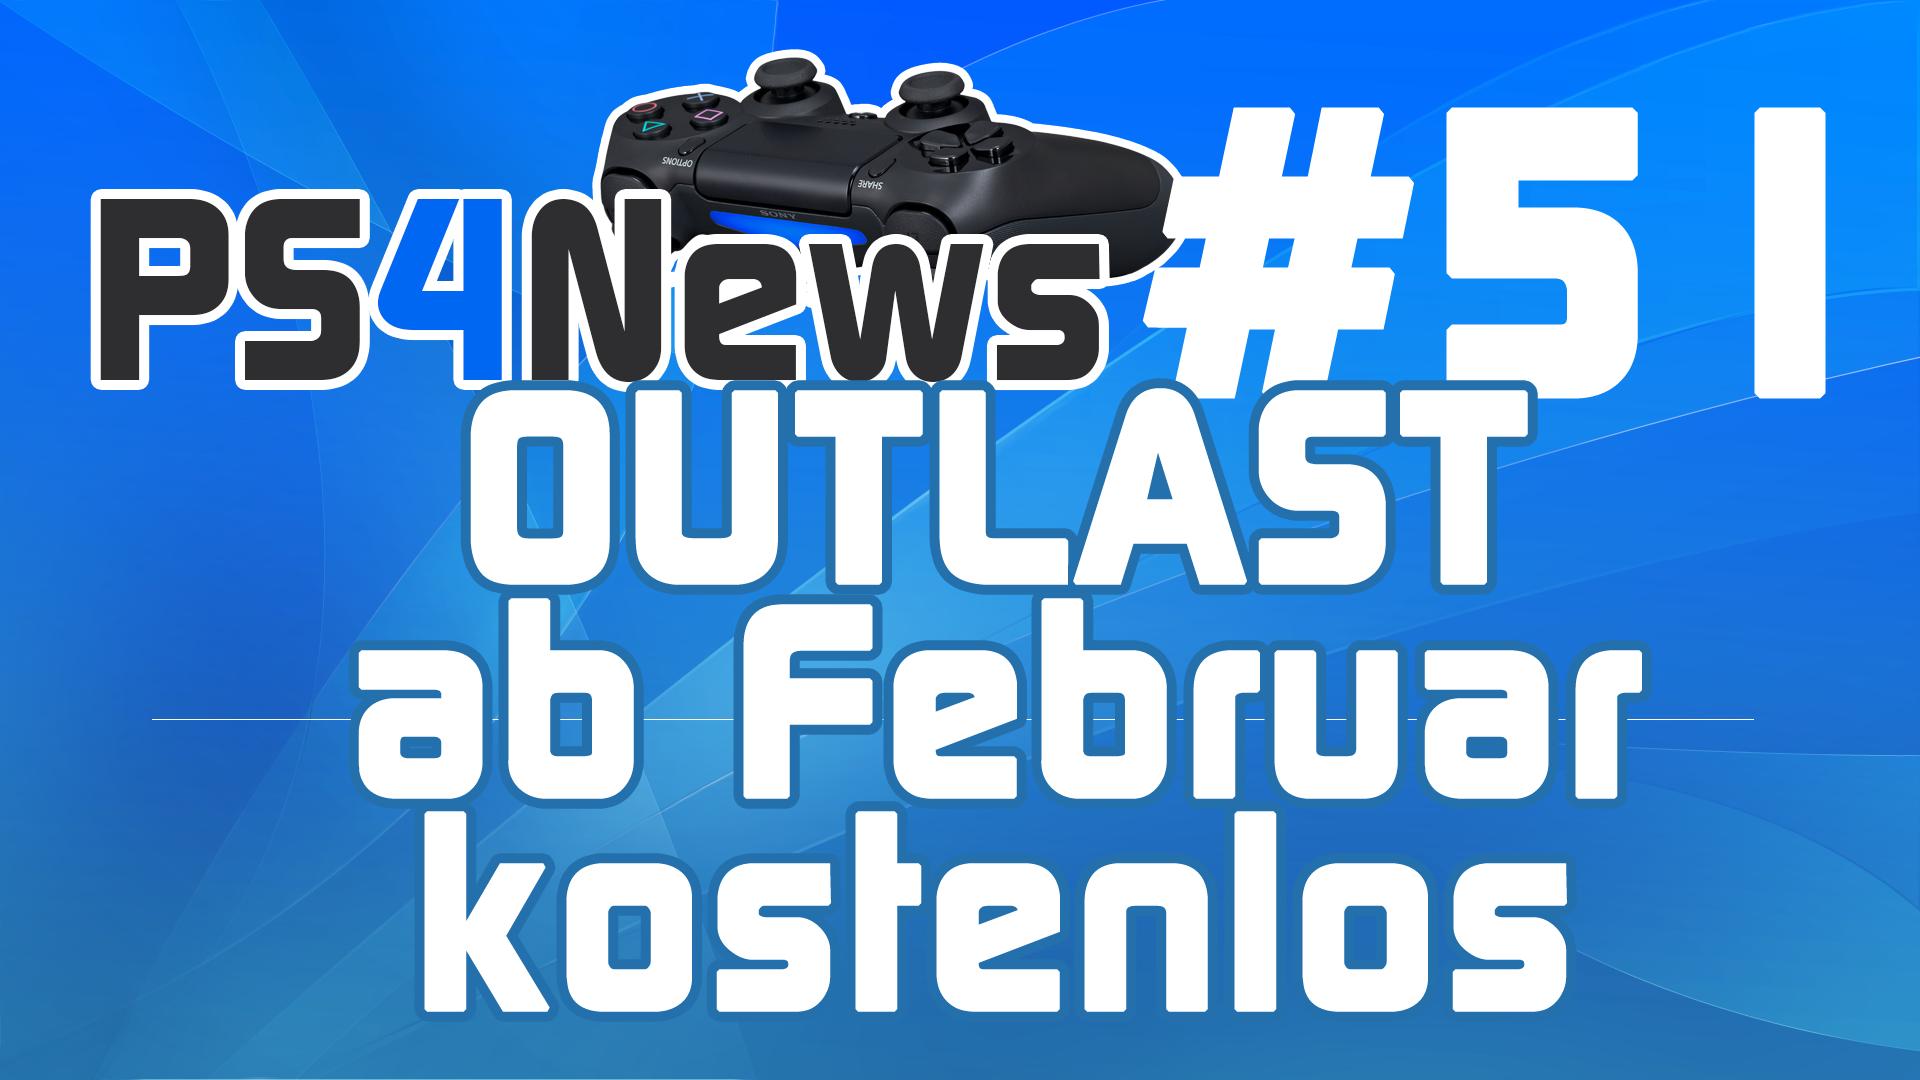 Outlast ab Februar kostenlos für alle PS Plus Abonnenten – Viele DualShock 4 Probleme?